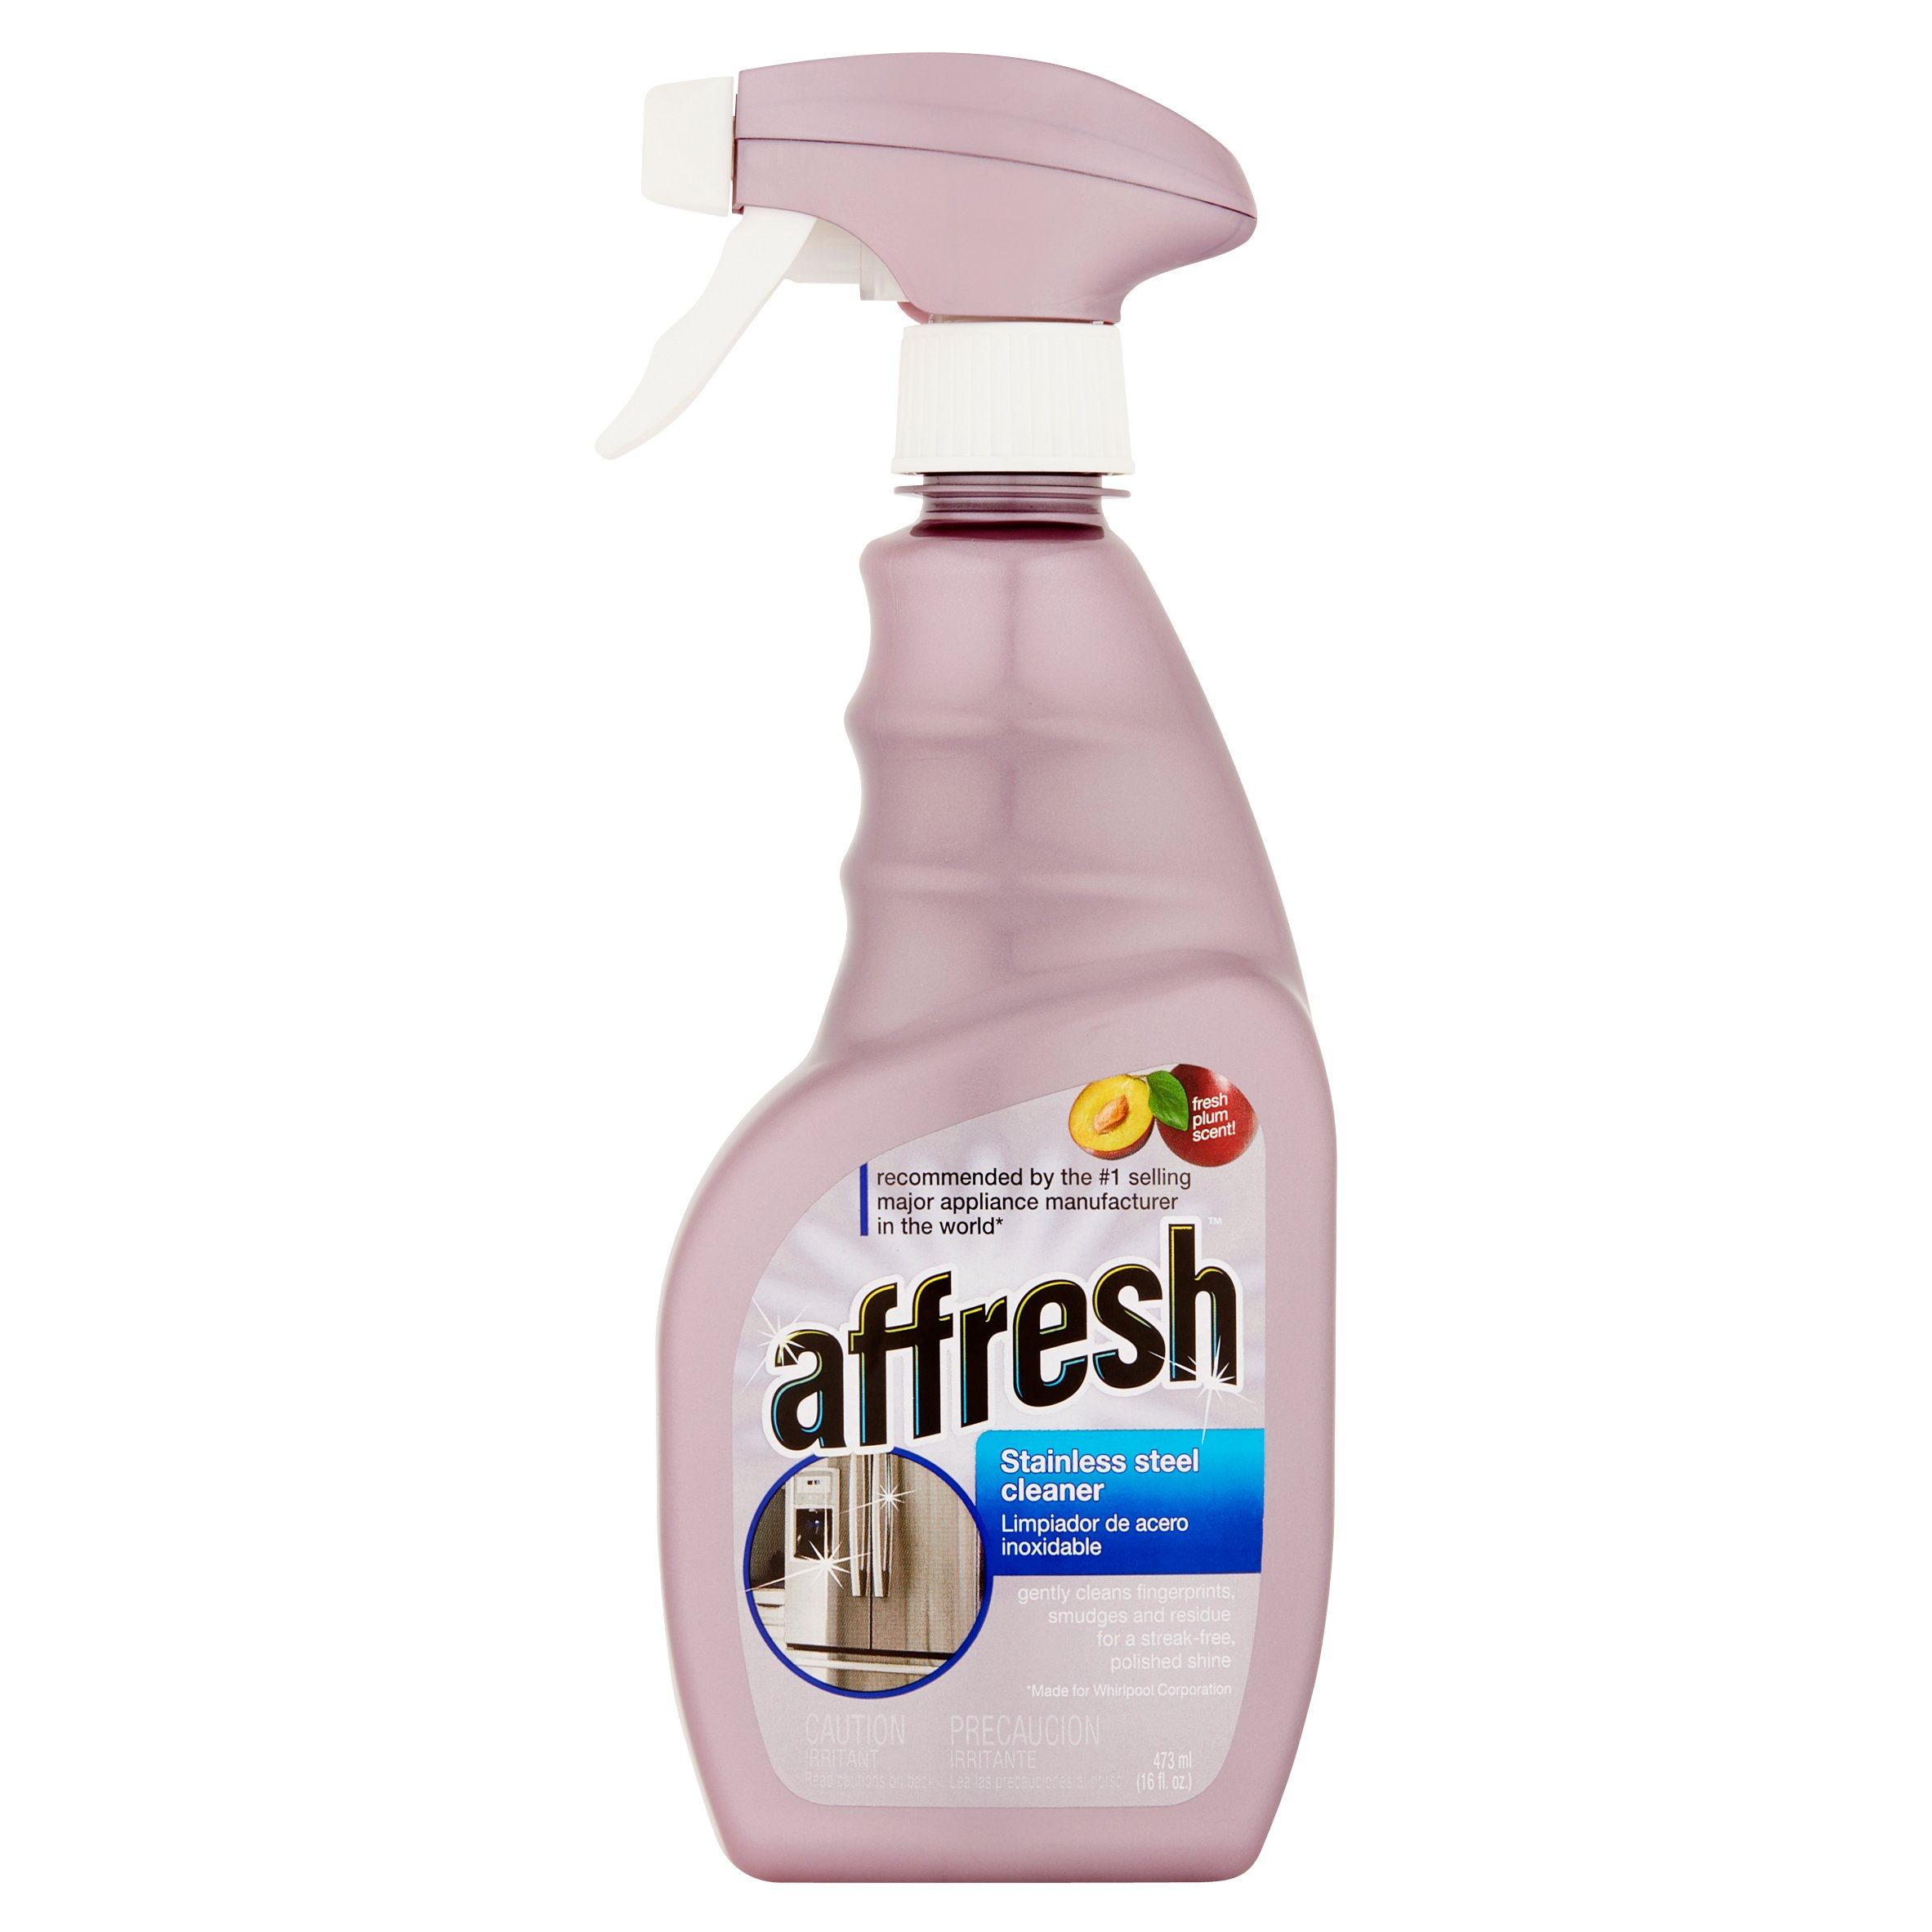 Affresh Stainless Steel Cleaner 16 Fl Oz Walmart Com Walmart Com